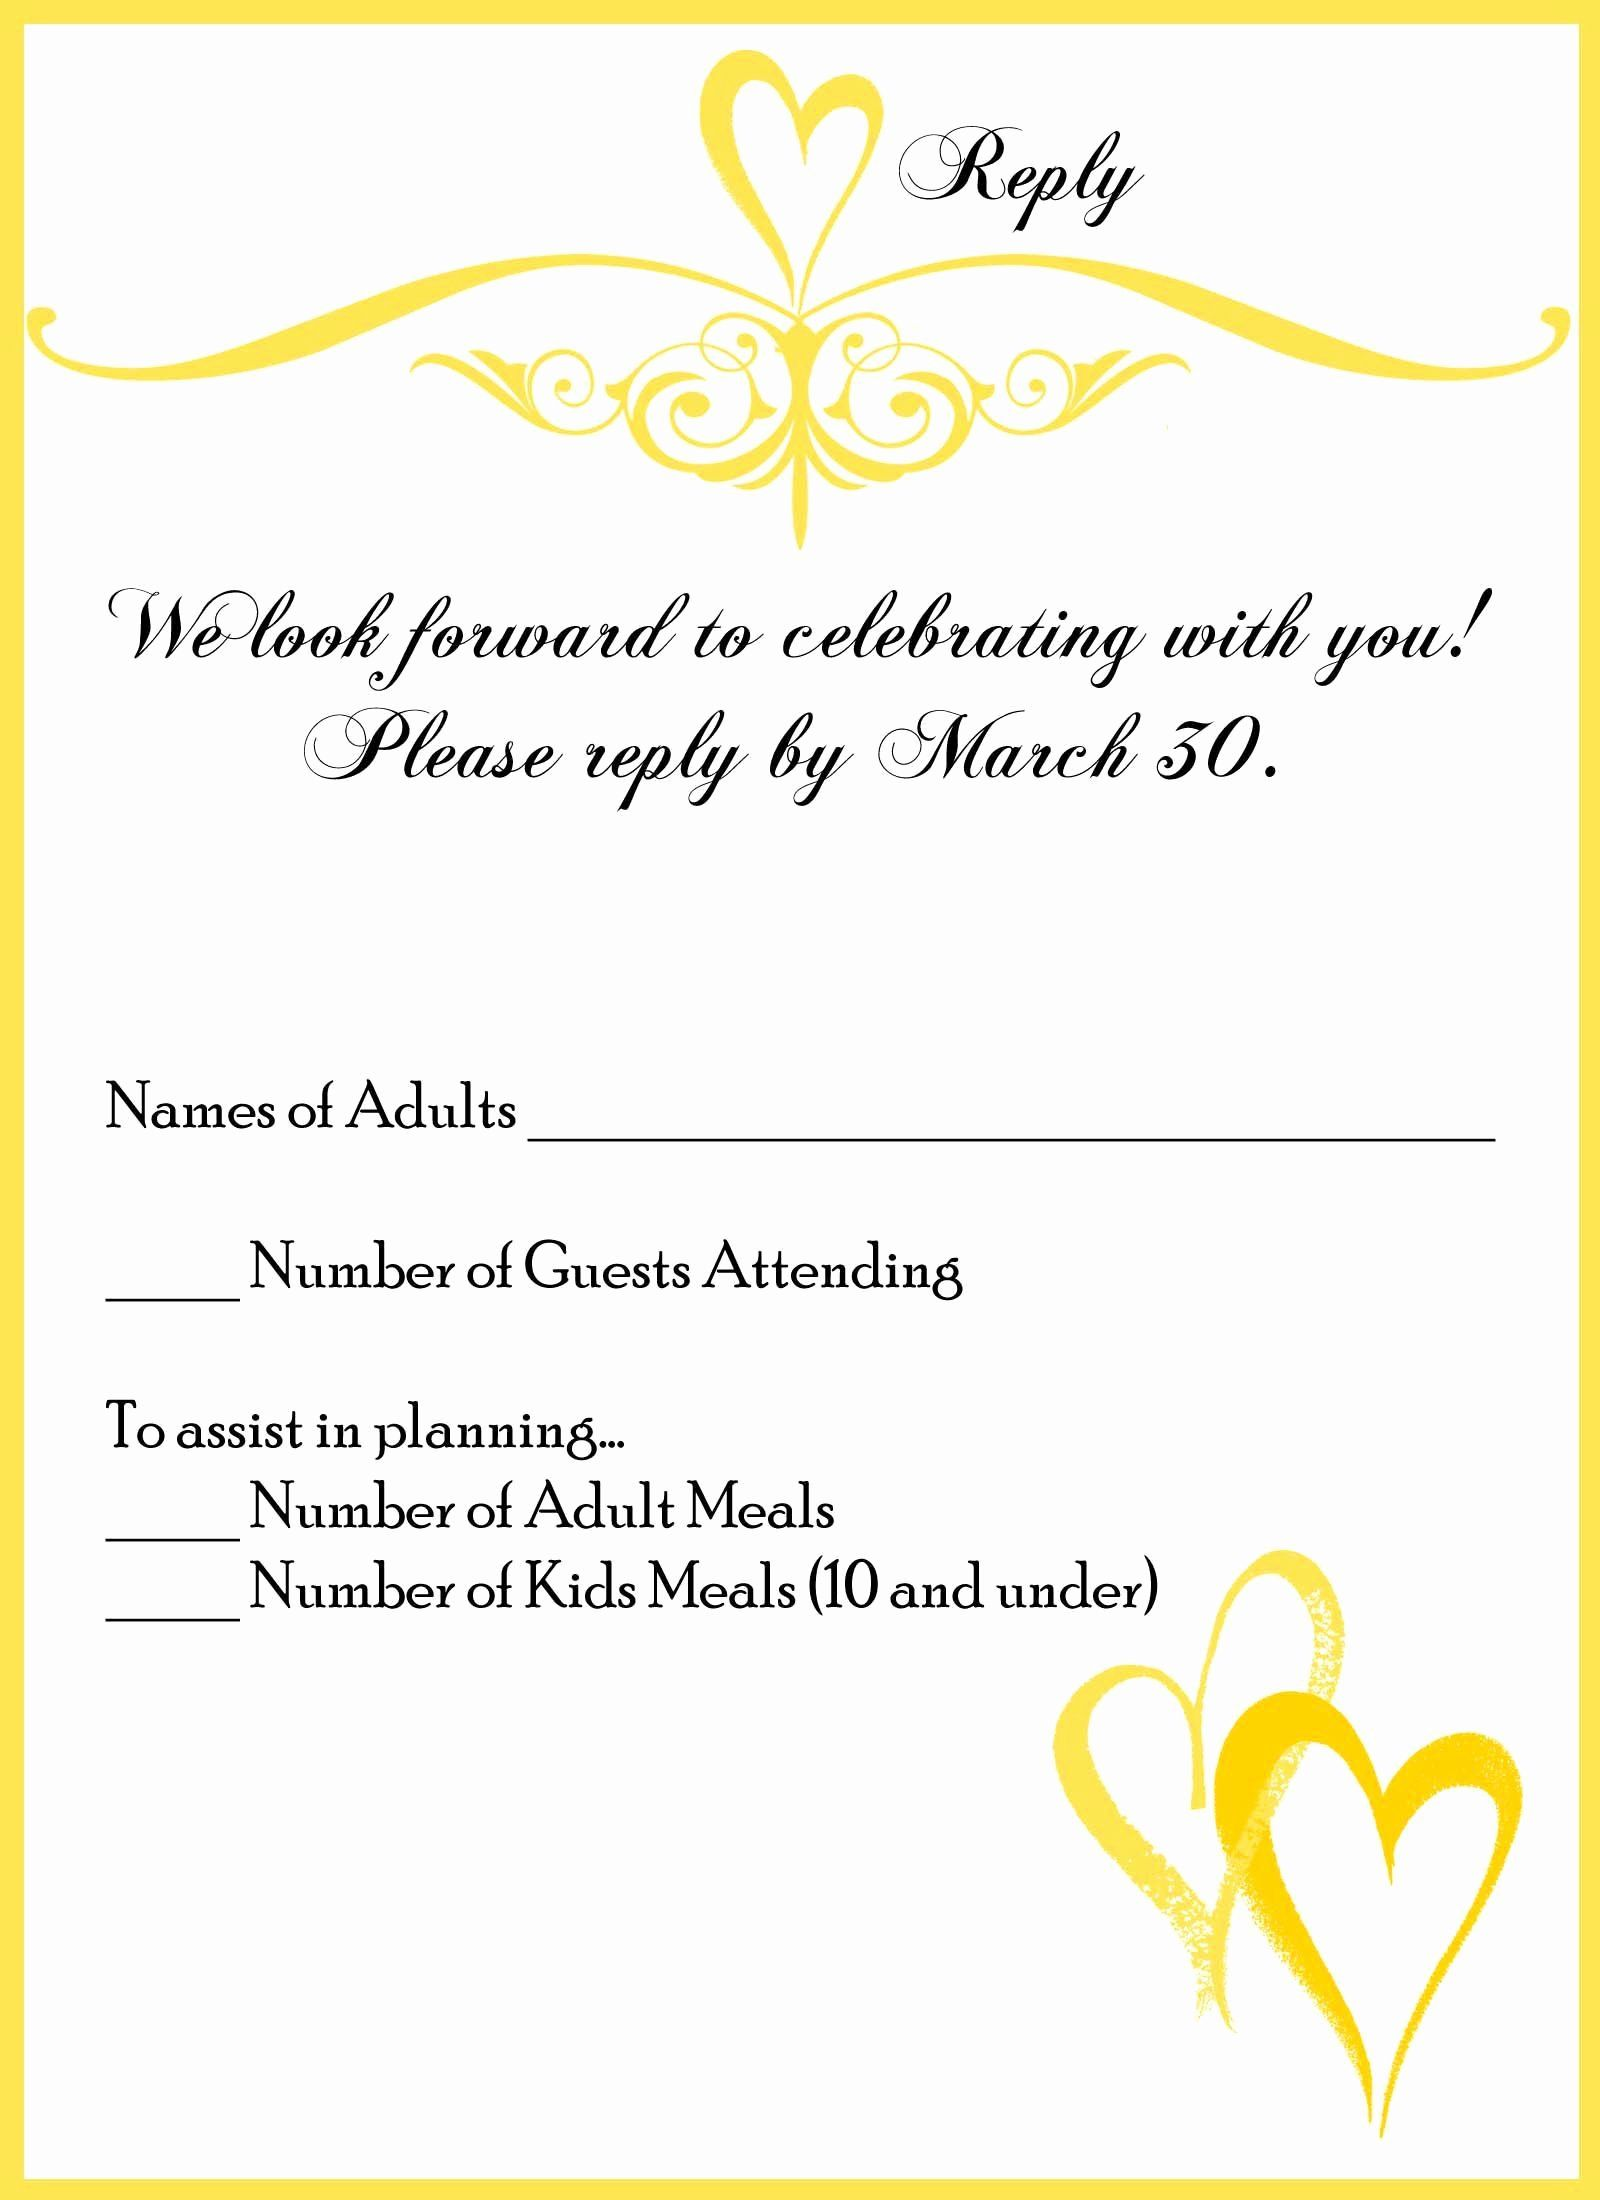 Wedding Response Card Unique Wedding Invite Reply Card Monzarglauf Verband In 2020 Wedding Response Cards Rsvp Wedding Cards Wedding Reply Cards